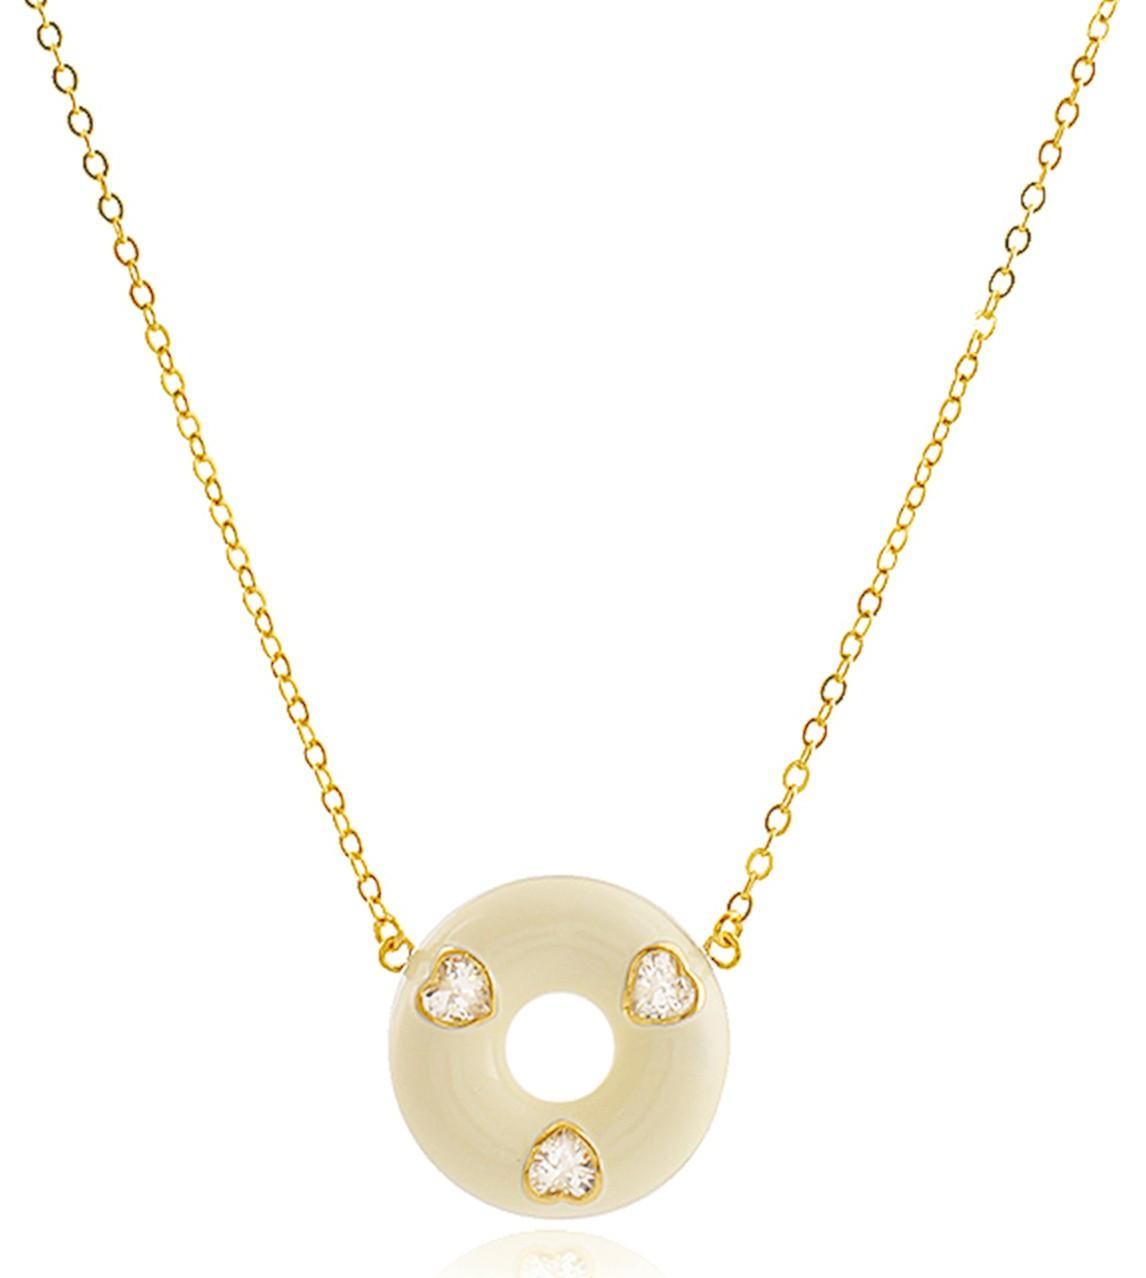 Colar Esmaltado Coração Branco Dourado Duquesa Semi joias